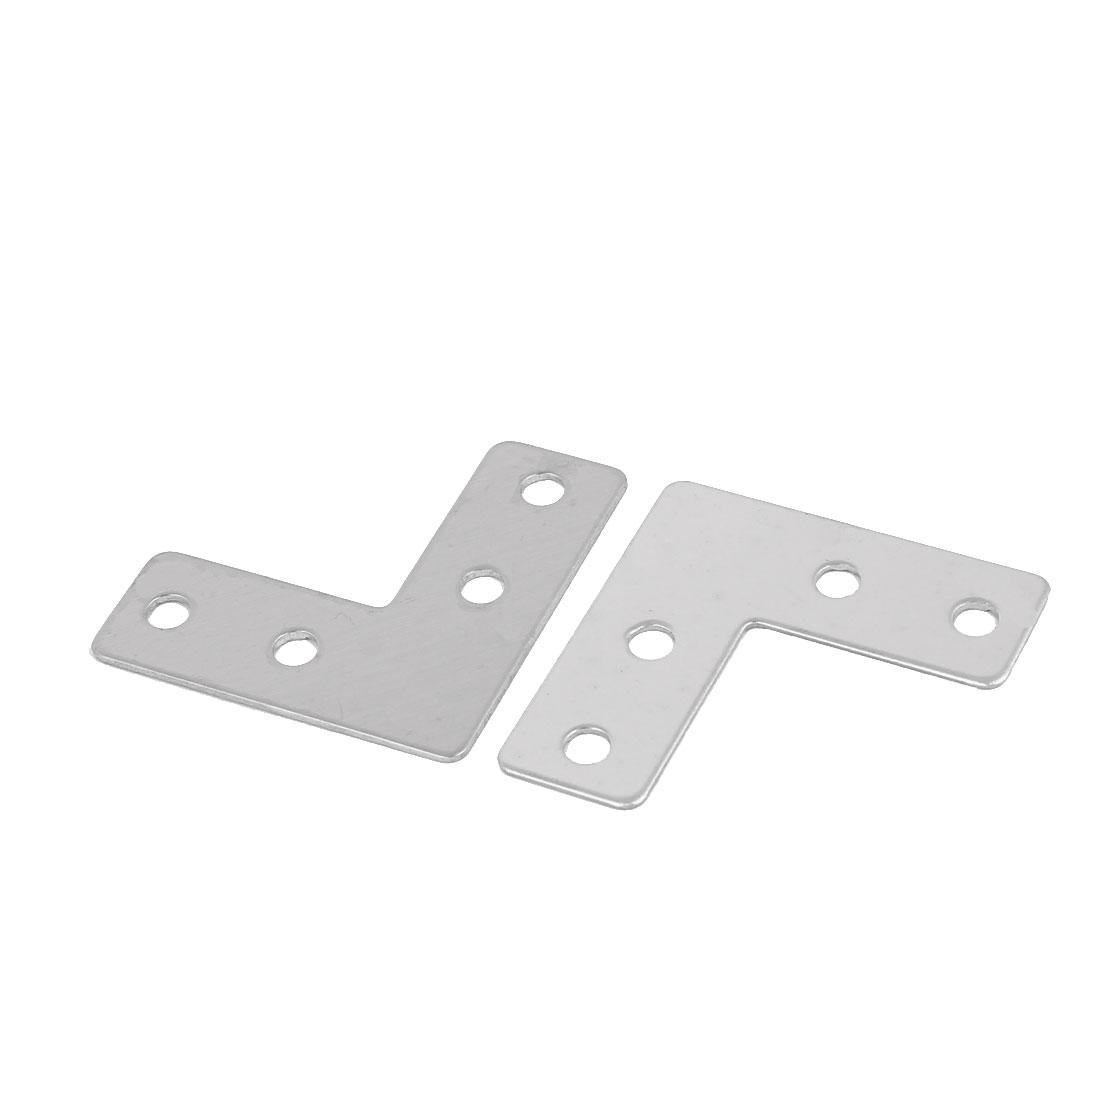 40mmx40mm L Shaped 4 Holes Flat Stainless Steel Angle Corner Brace 2 Pcs